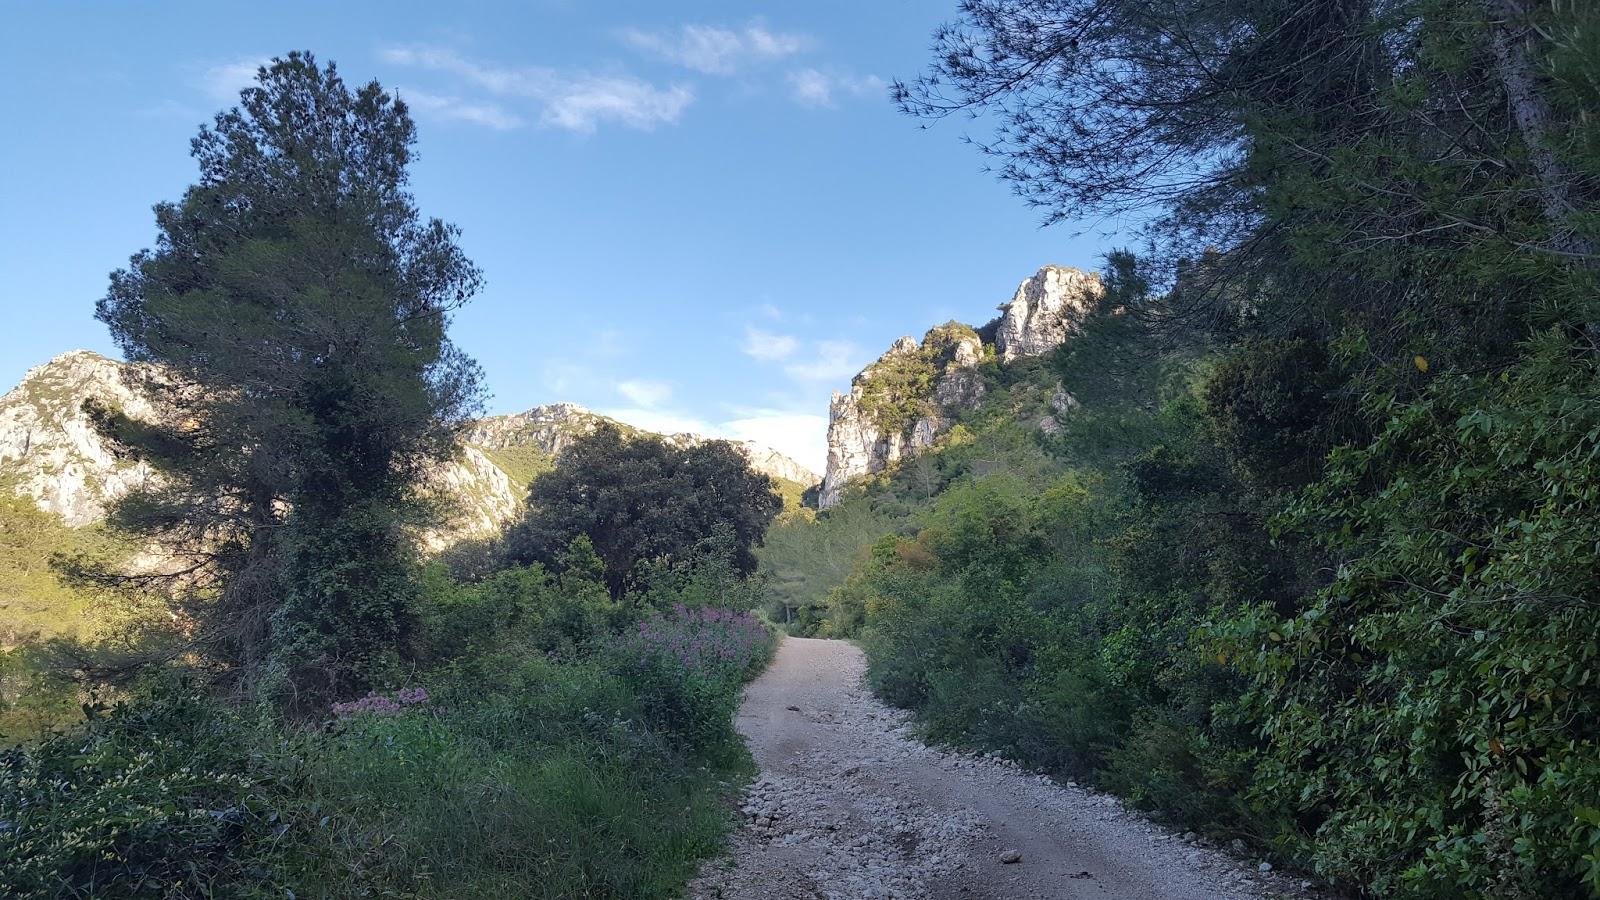 Cycling in Valencia - Climb to Buixcarró, Pla de Corrals